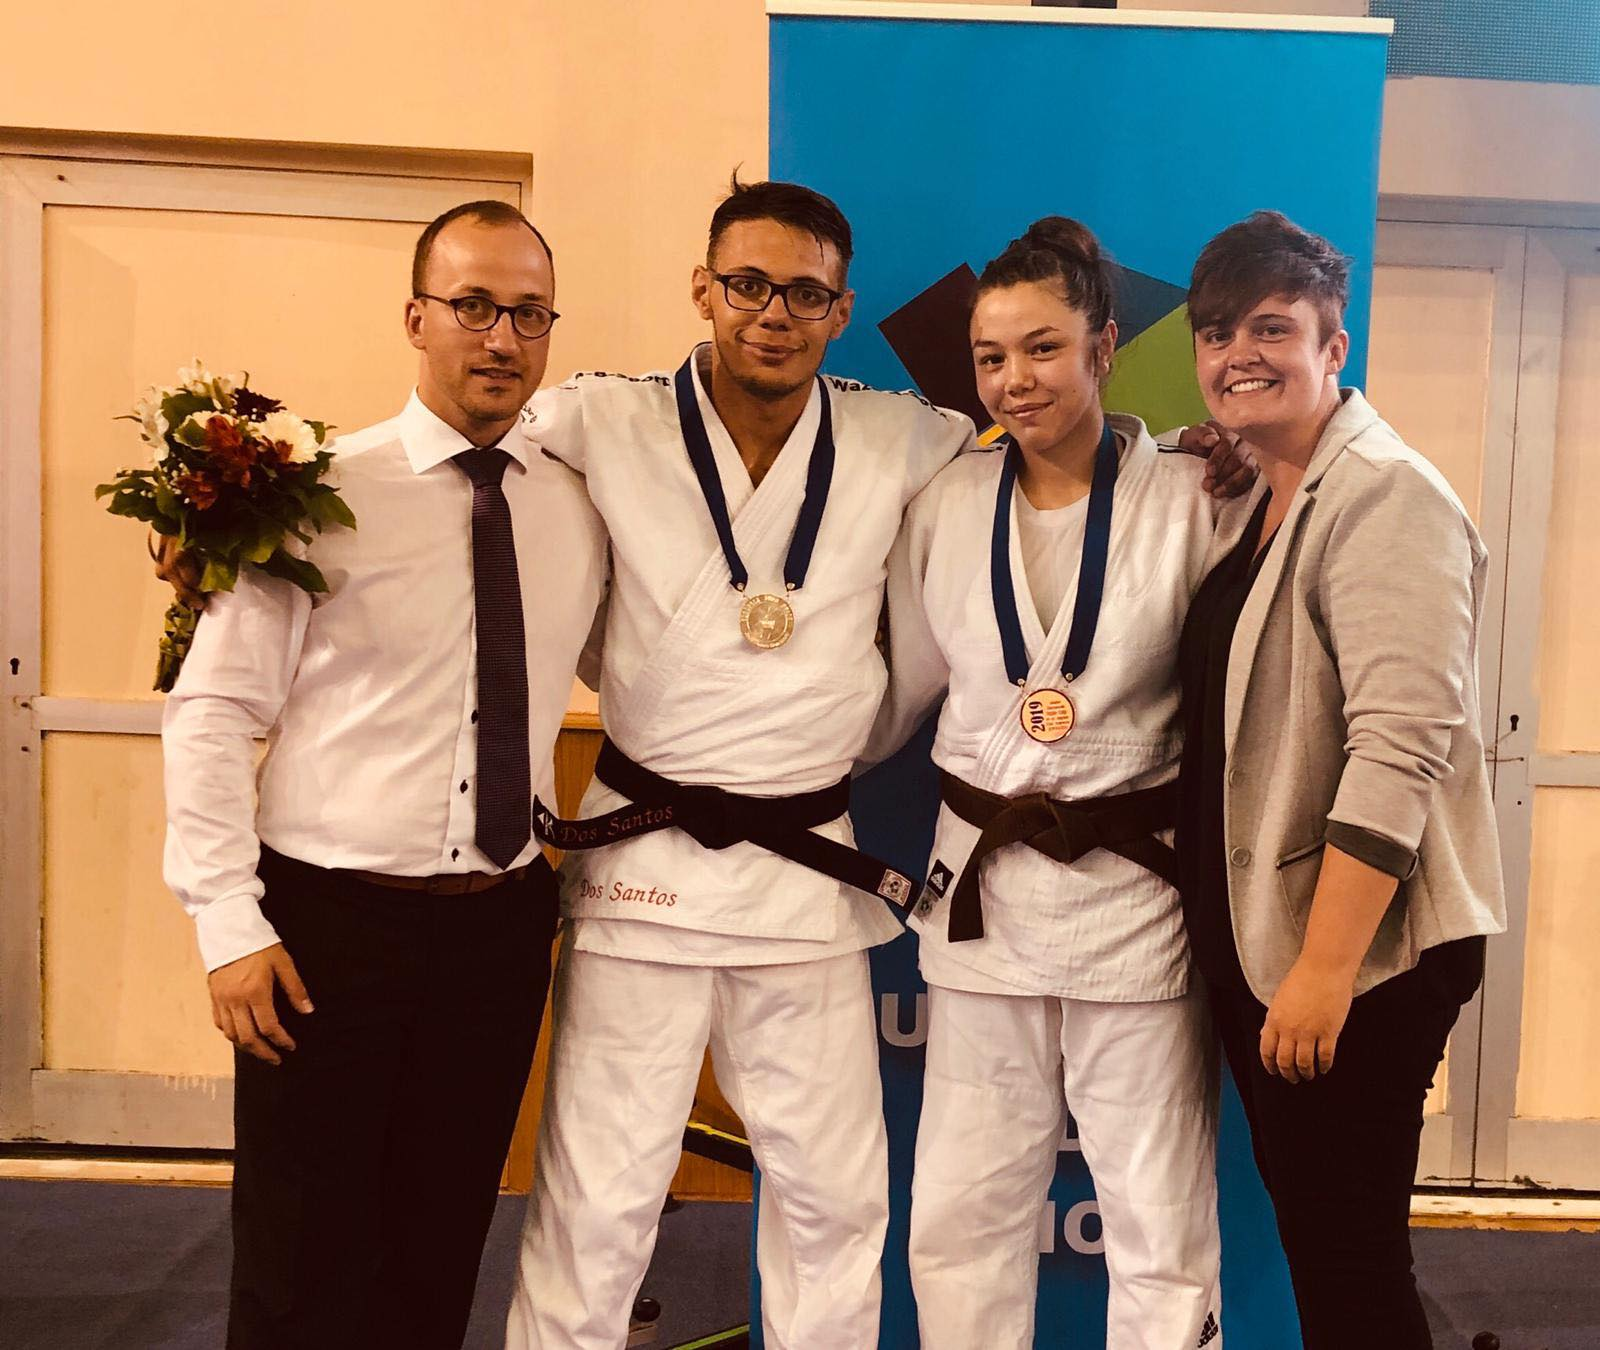 Interreg Judo Team - U21 European Judo Cup Cluj-Napoca (ROU) 10-11.08.2019